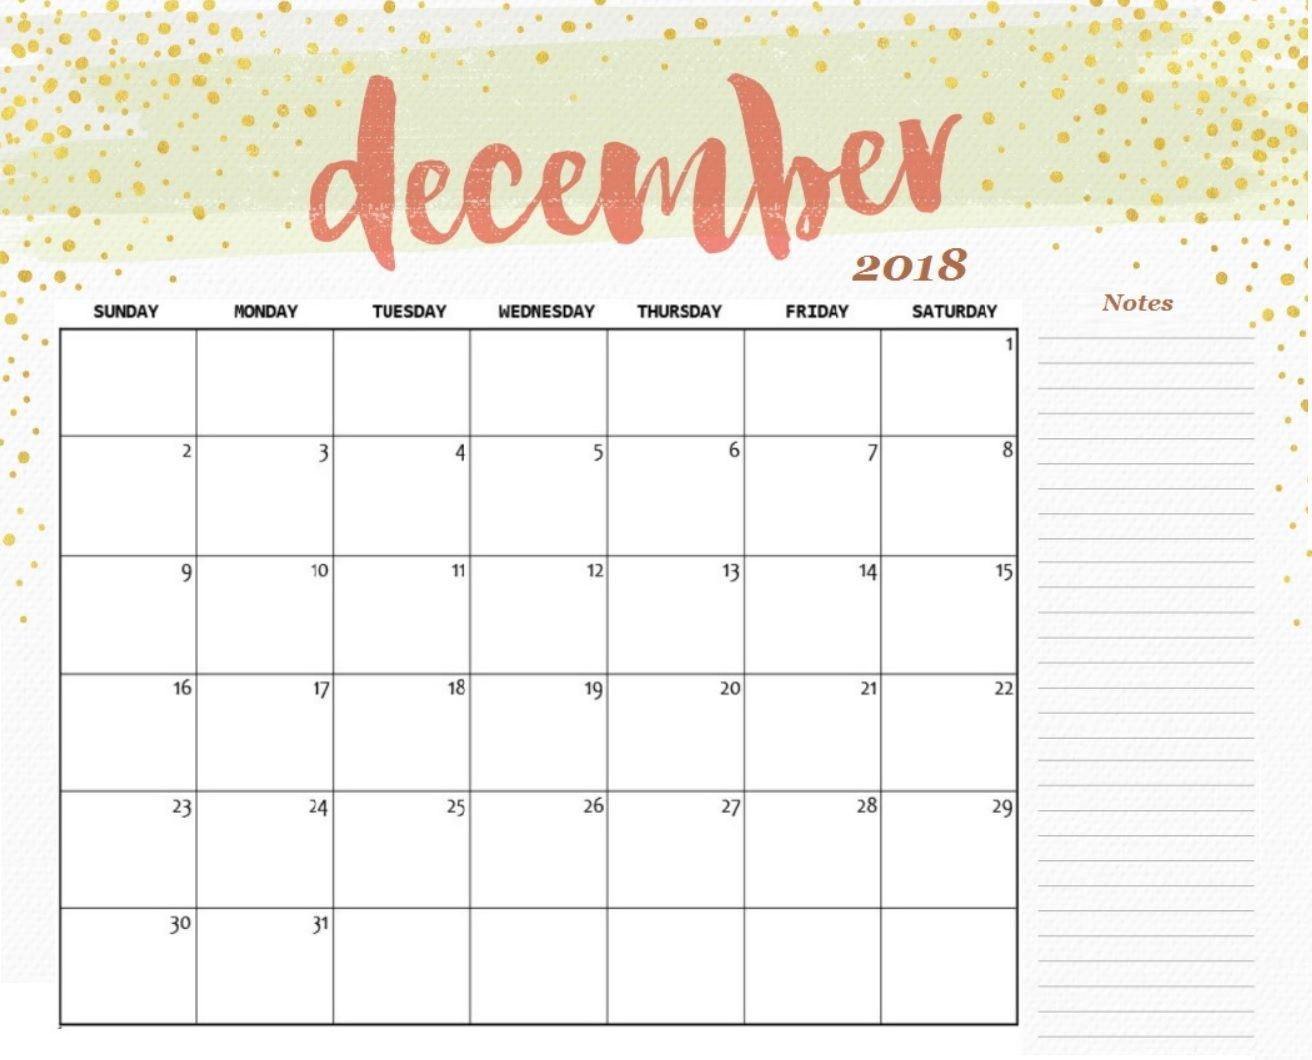 December 2018 Calendar Printable Template | 100+ December 2018 throughout December Blank Calendar Page Printable